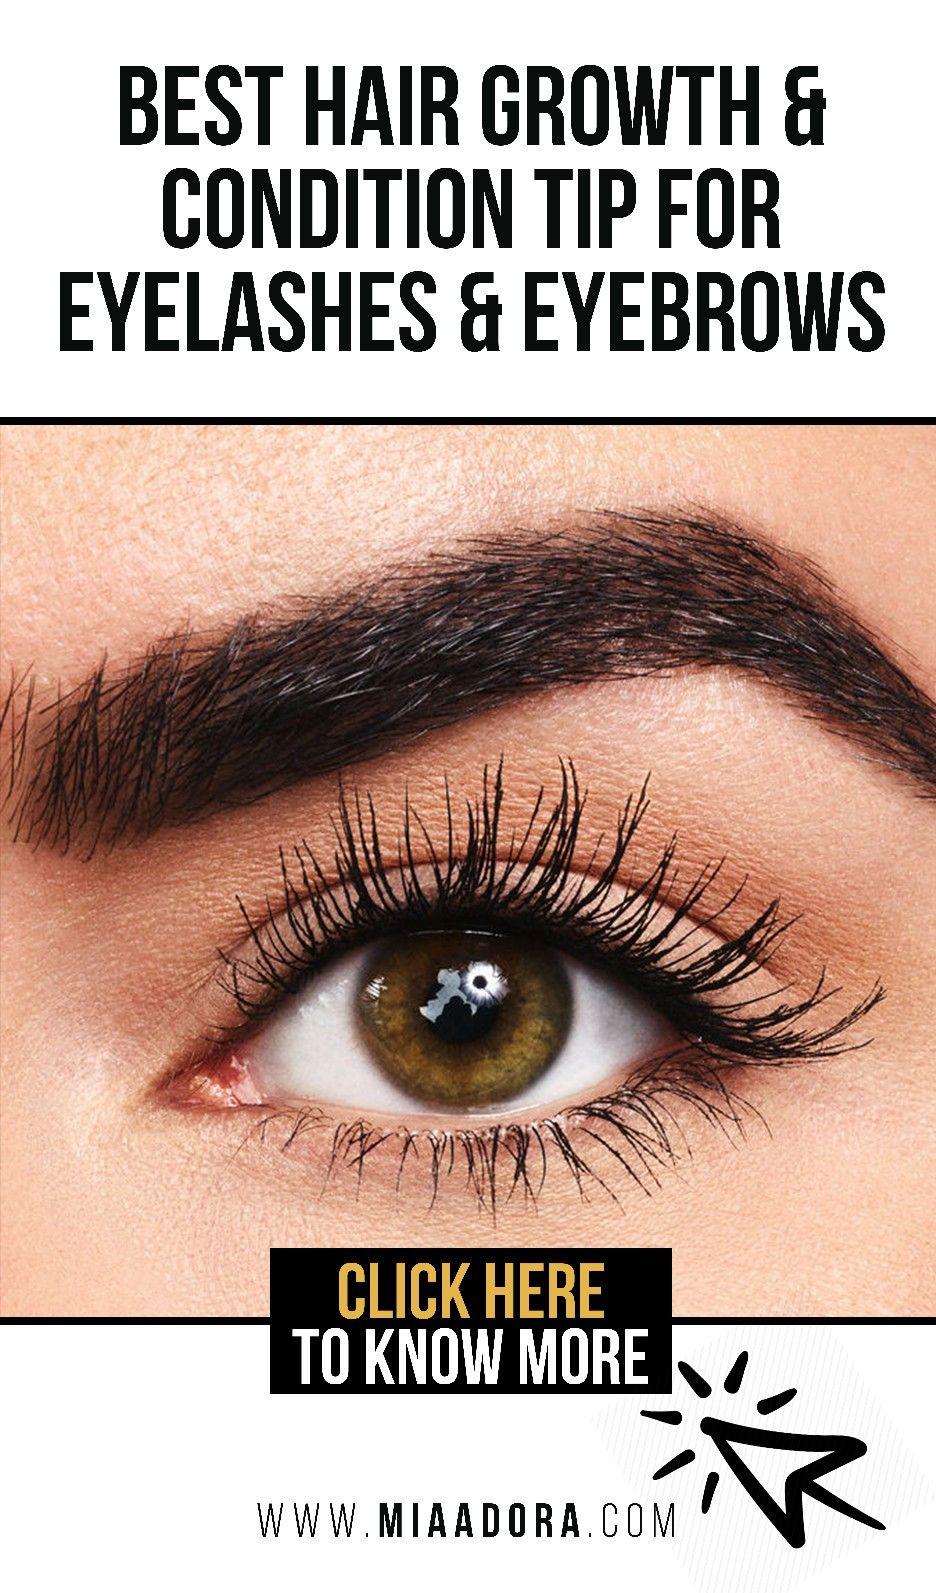 castor oil recipes uses eyelashes longer long grow help eyelash